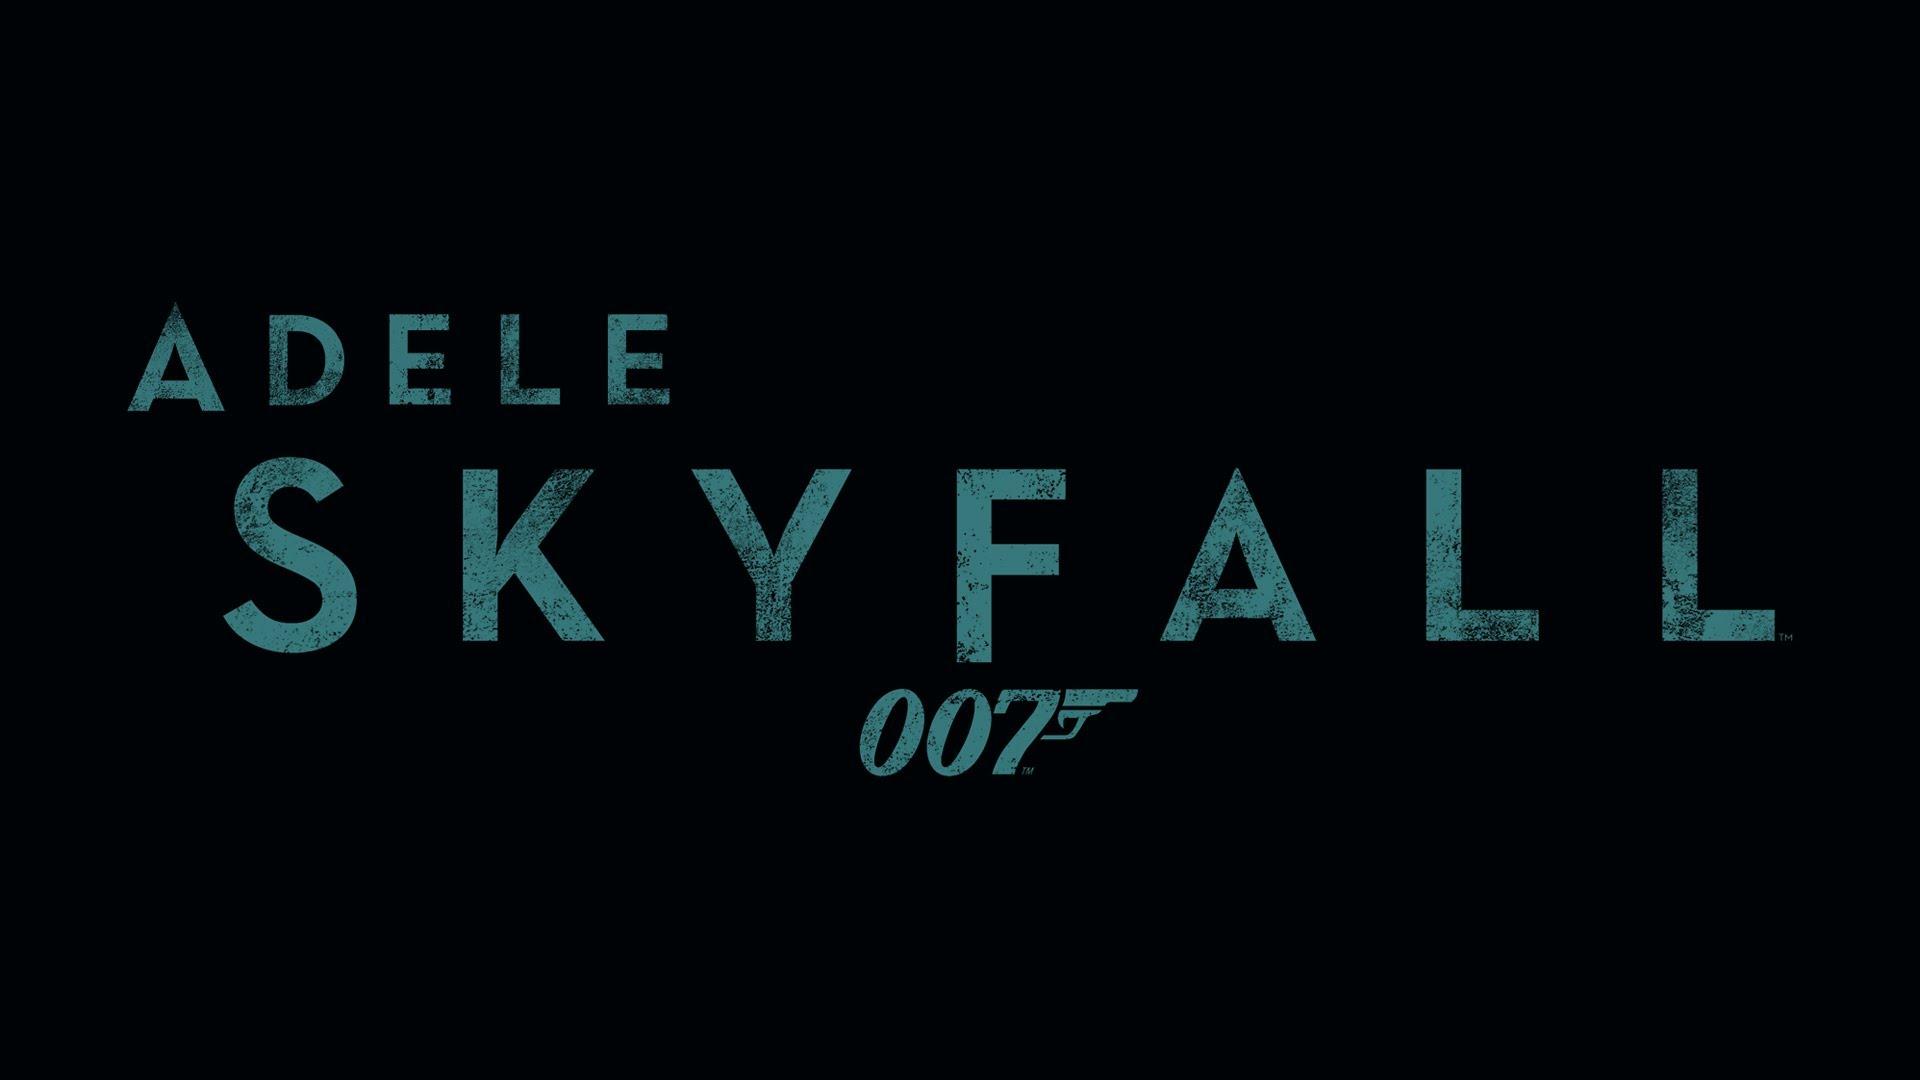 Skyfall Adele Lyrics